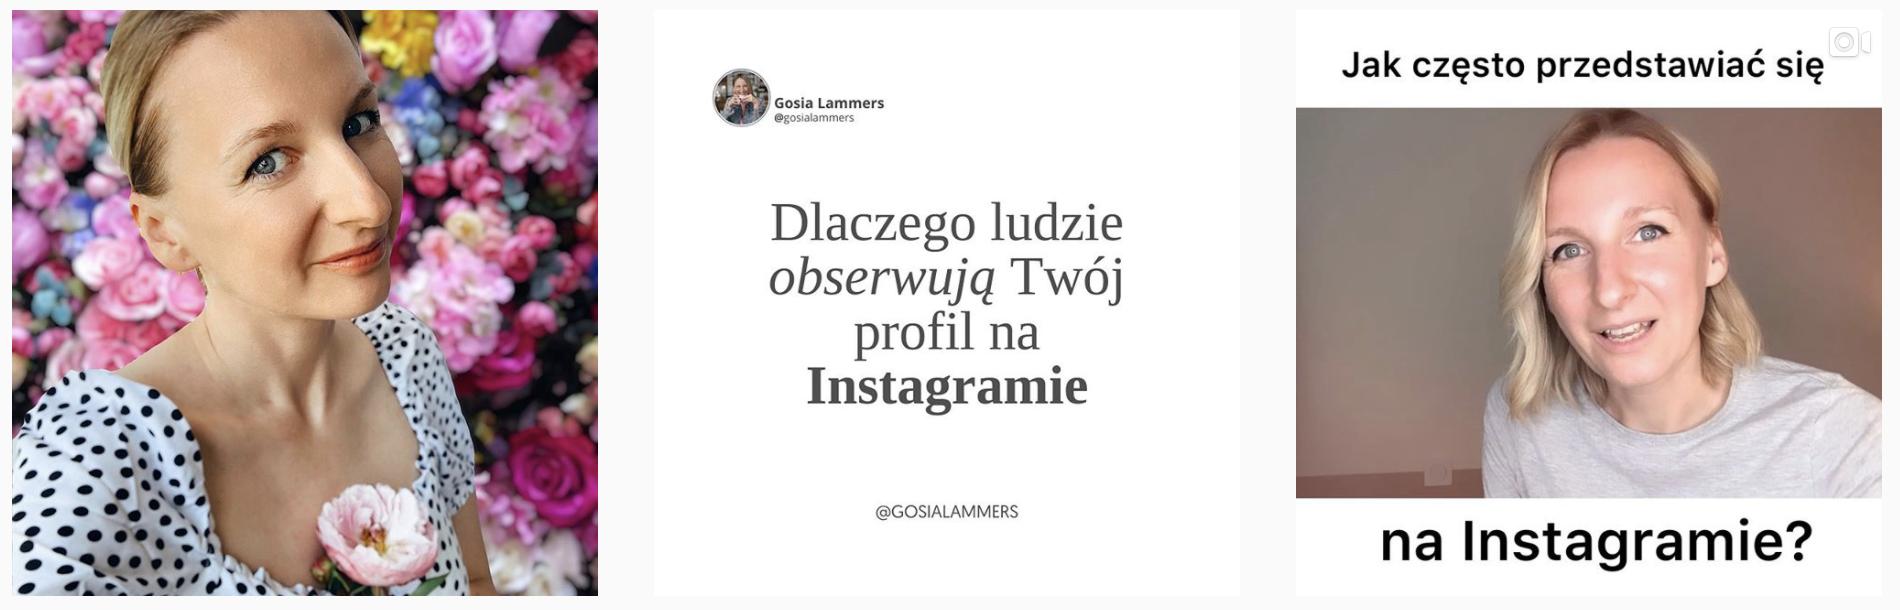 Instagram profil Gosia Lammers